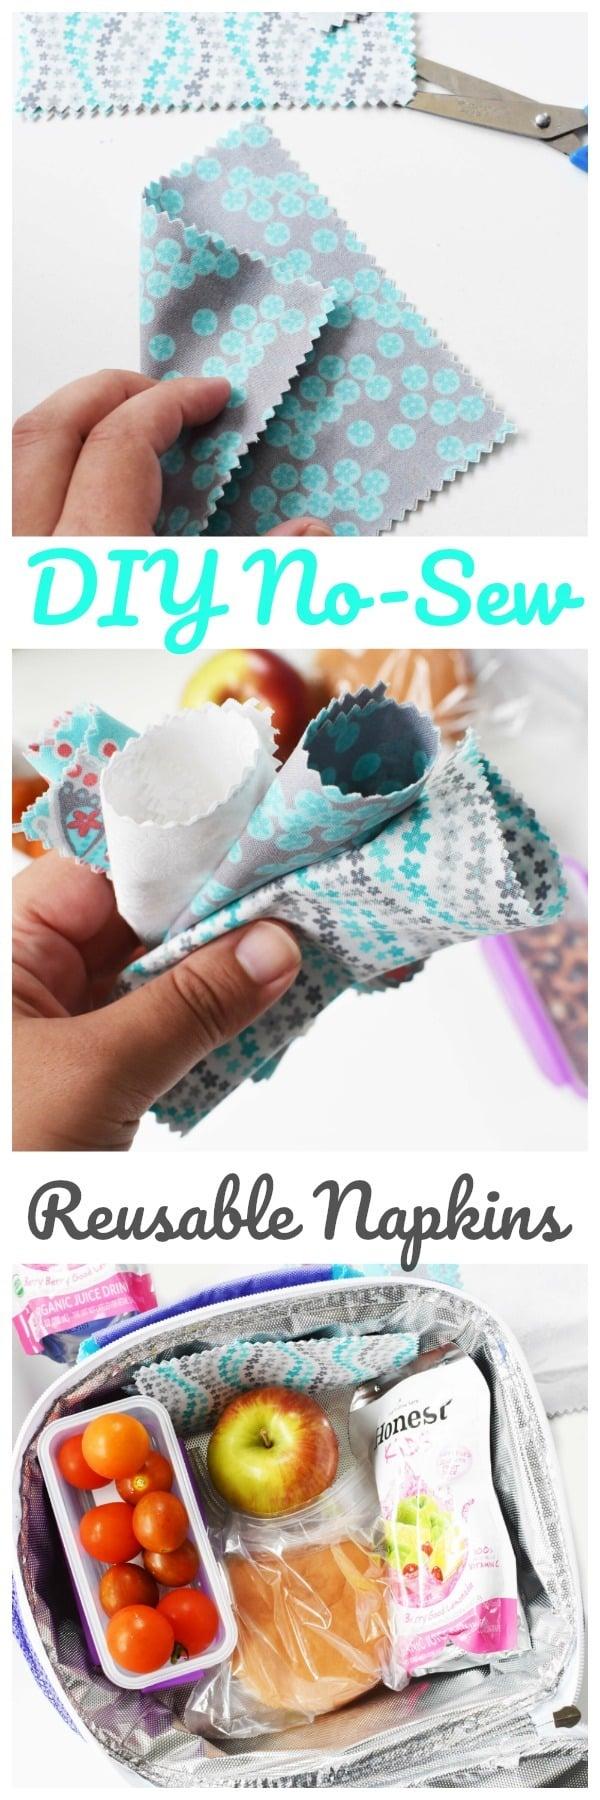 DIY No-Sew Reusable Napkins